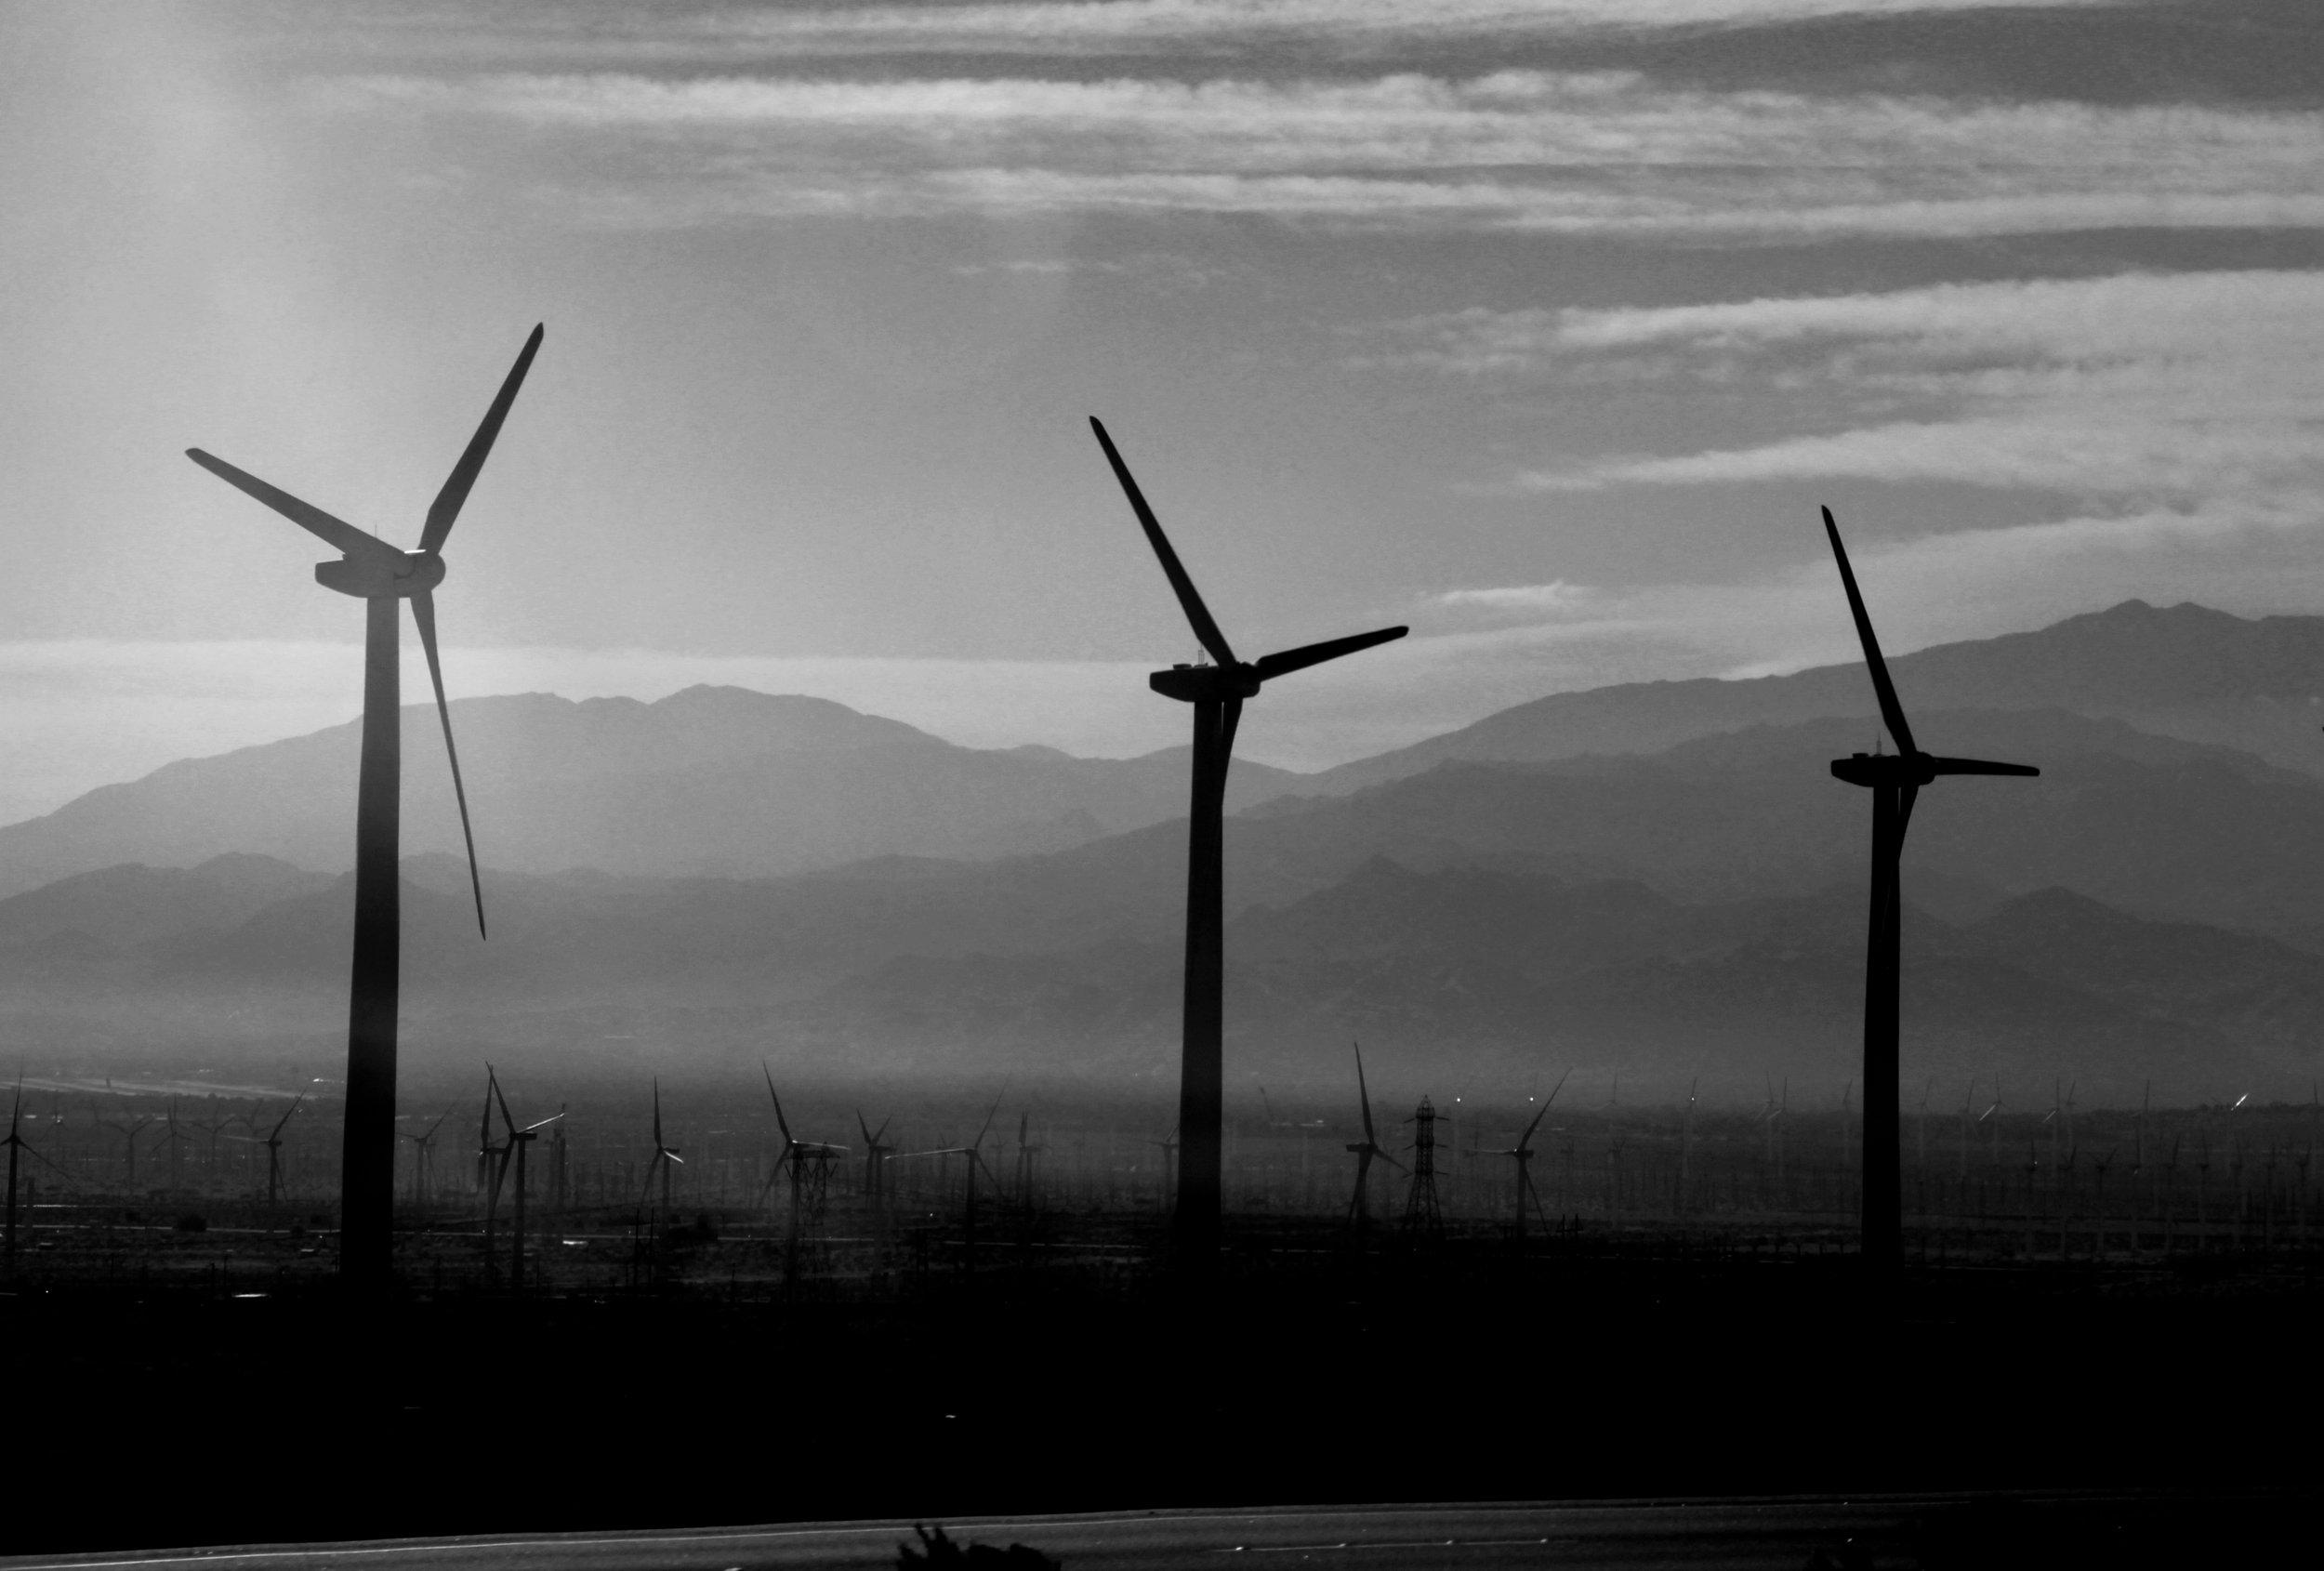 2011_11_19_10_12_Canon EOS REBEL T2i_3416X5052_ISO200-002_San Gorgonio Pass_California_2011_The Wind Farm.jpg